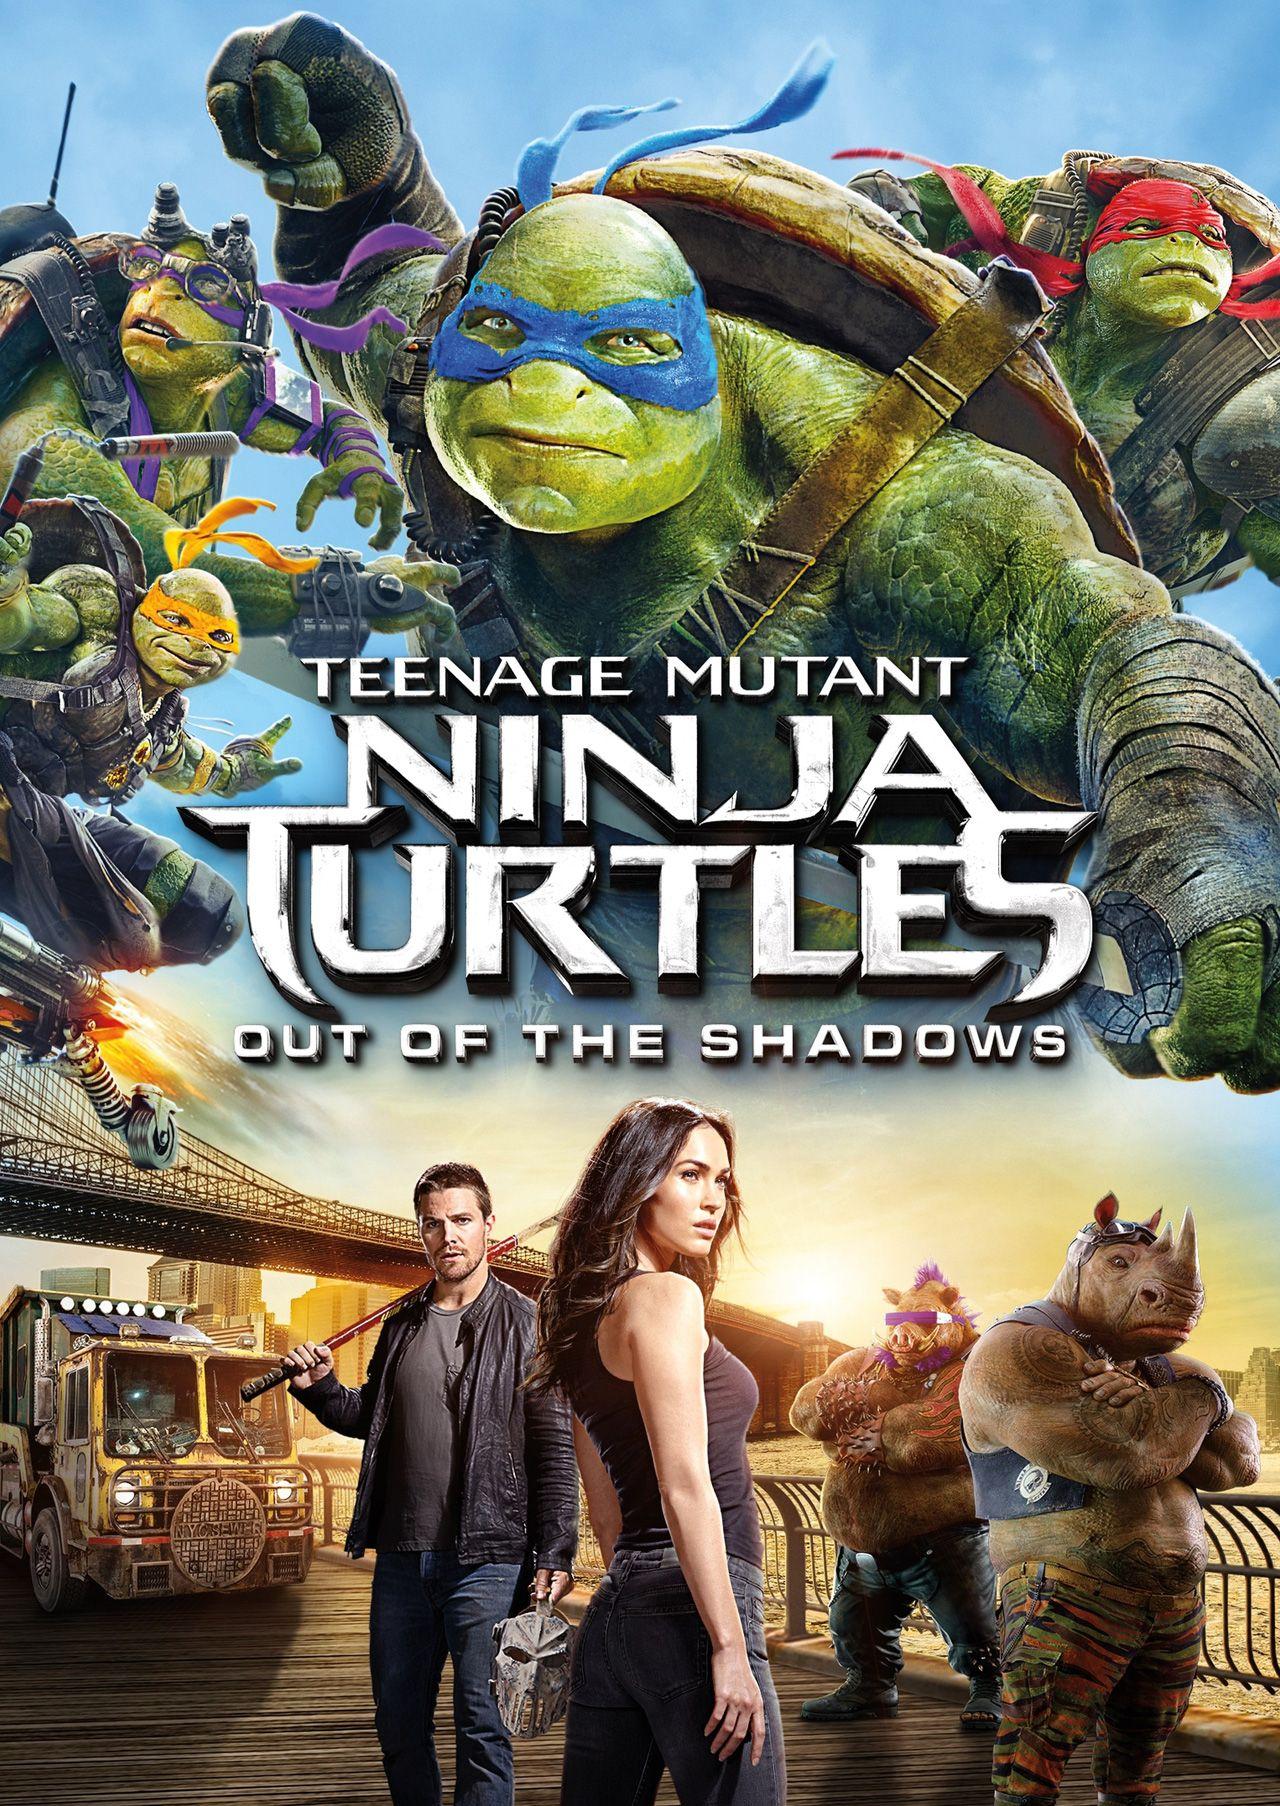 Teenagemutantninjaturtles Movieposter Posters Tmnt Movies Tortugas Ninjas Adolescentes Mutantes Tortugas Ninja Leonardo Tortugas Ninjas